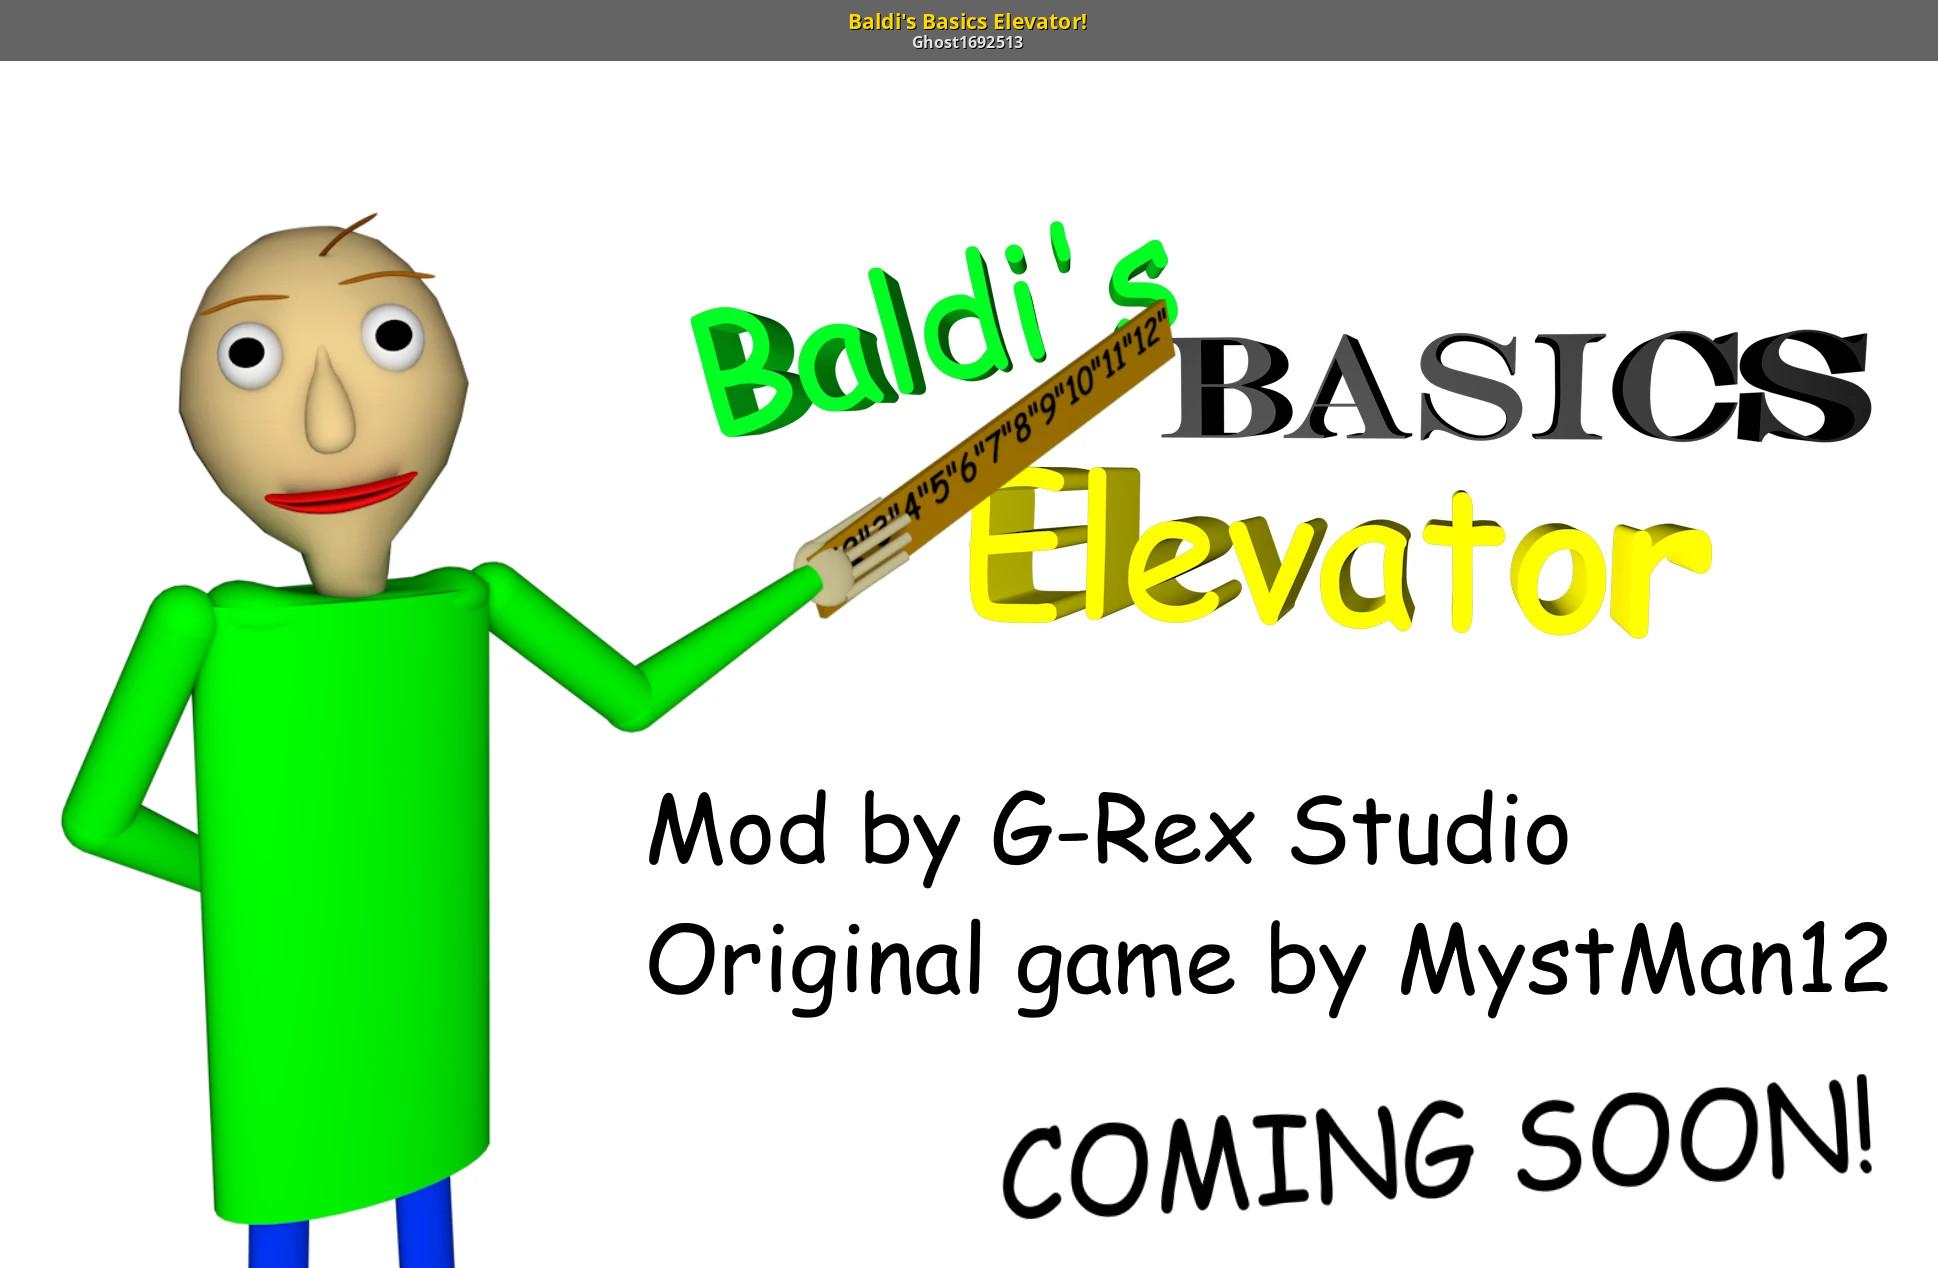 Baldi's Basics Elevator! [Baldi's Basics in Education and